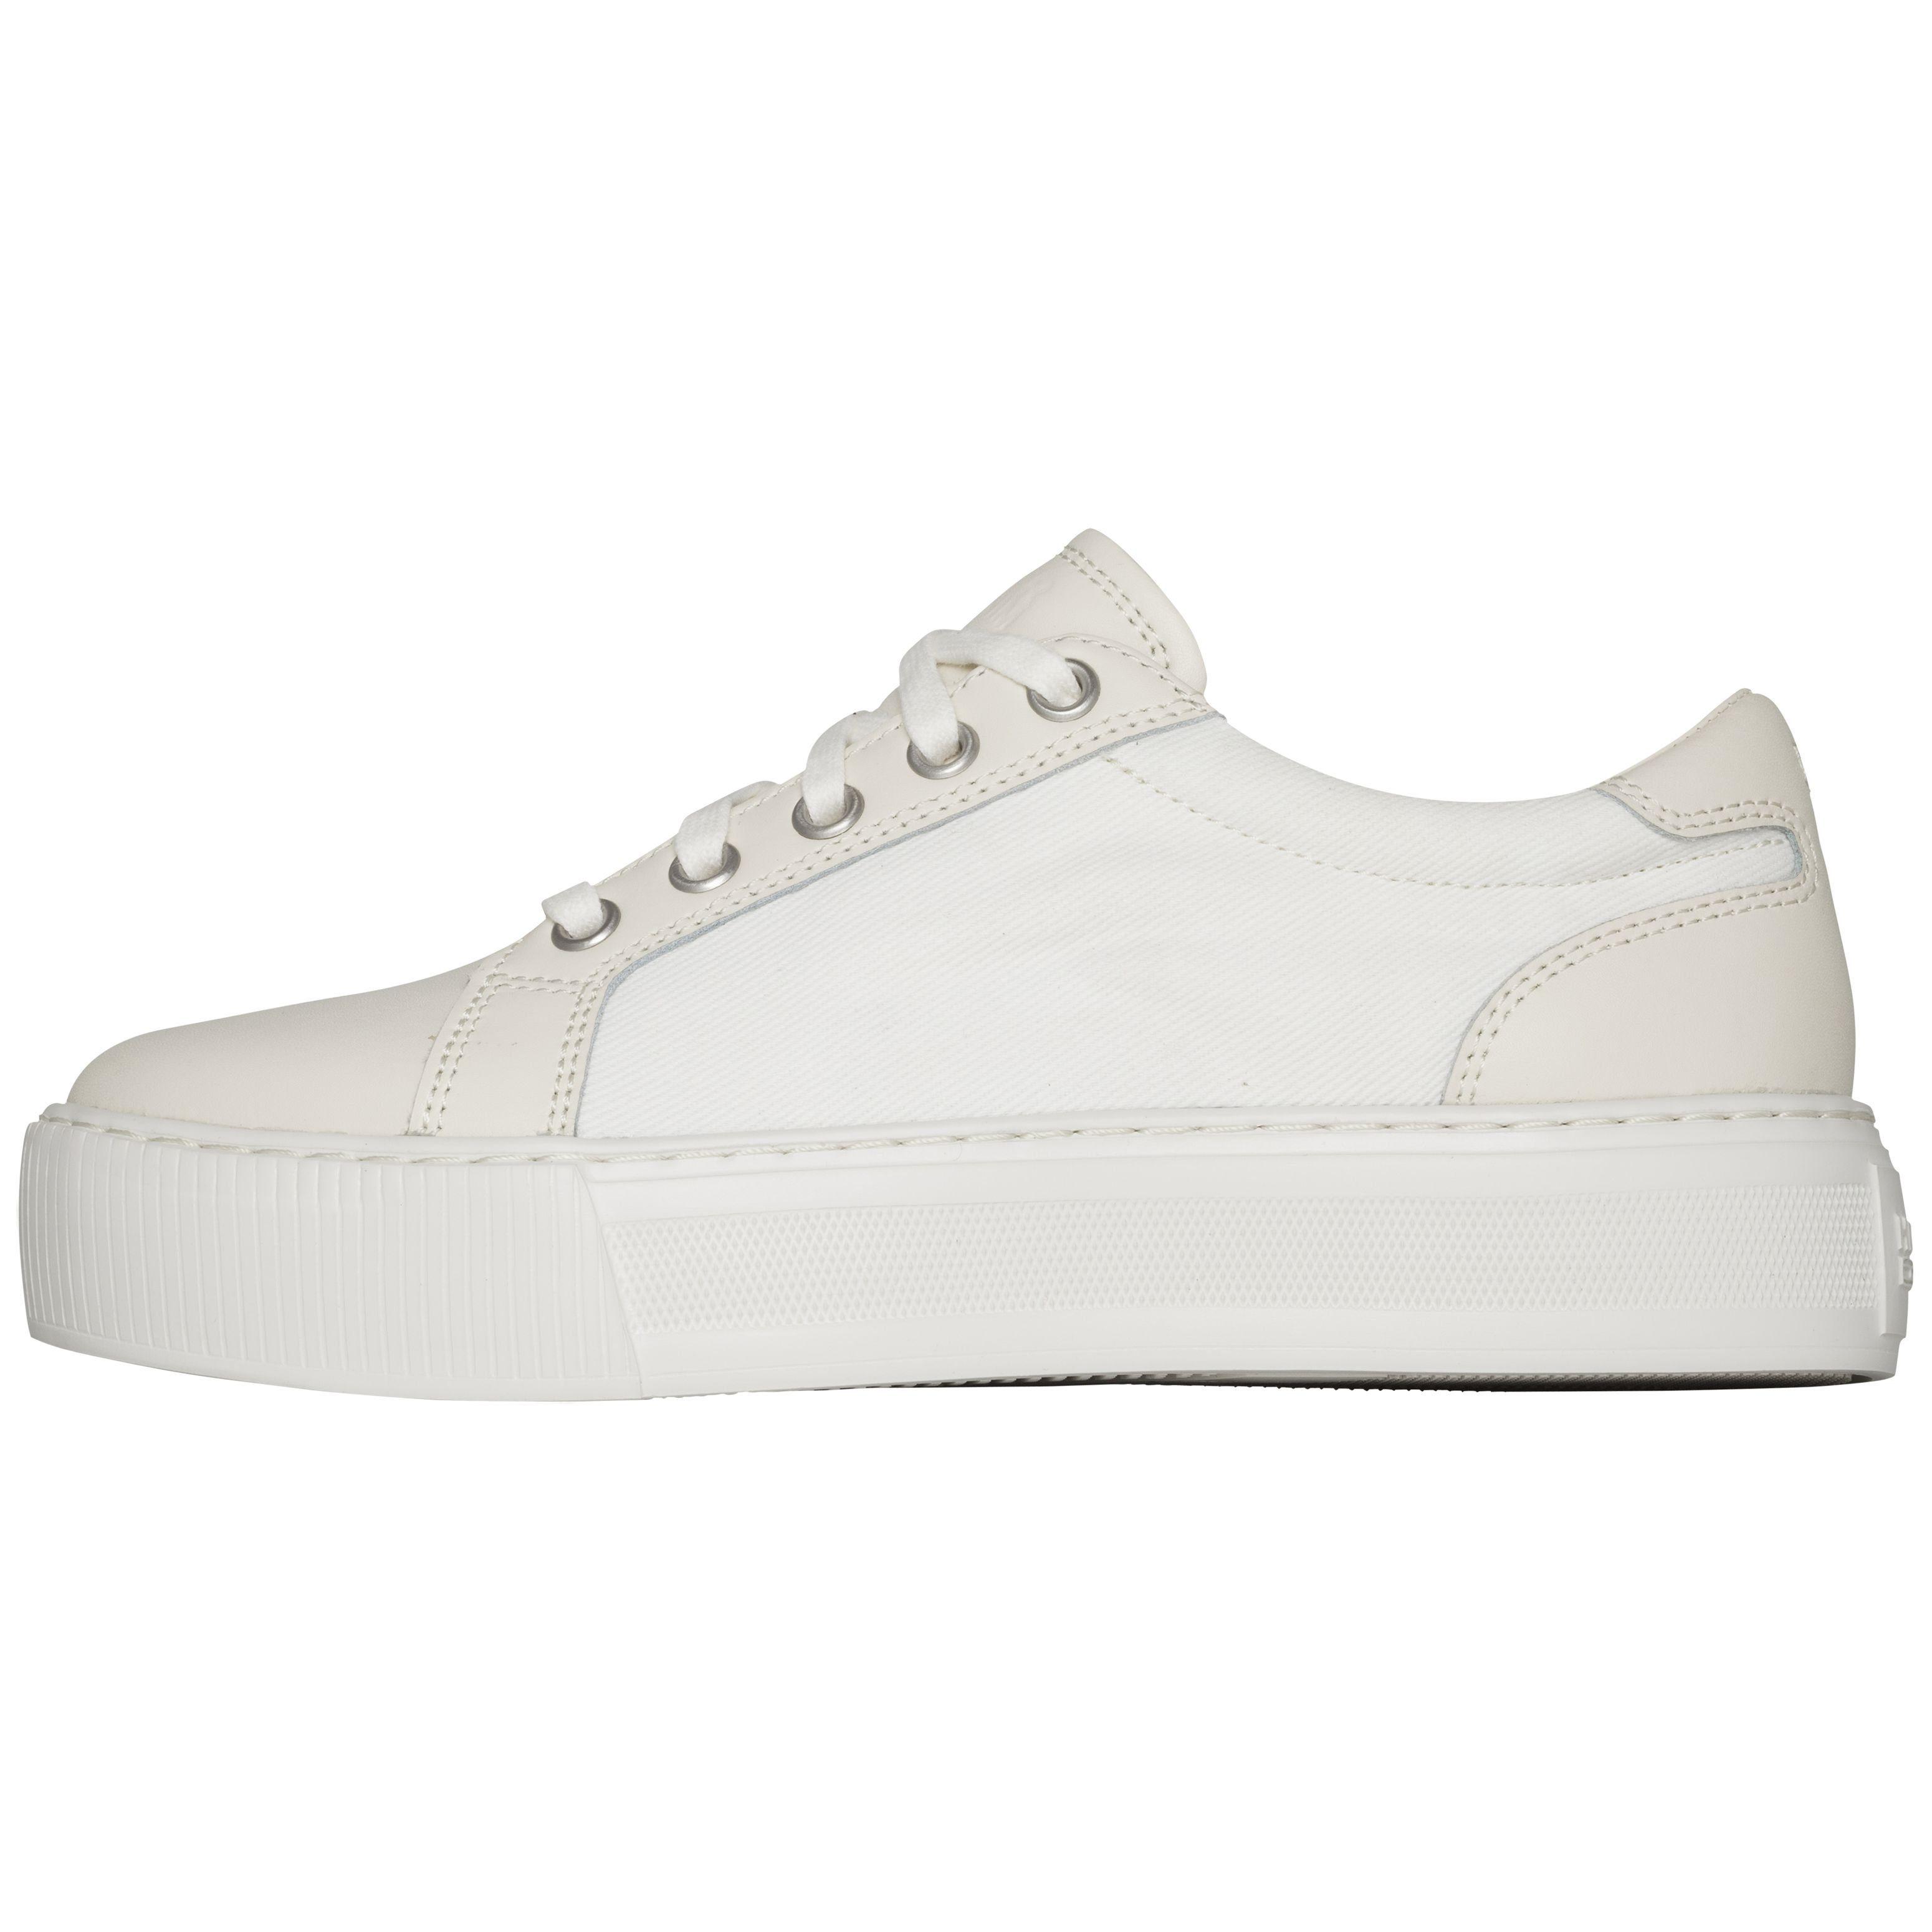 Tommy Hilfiger Sneaker D1385OLLY 1C1 kaufen  White